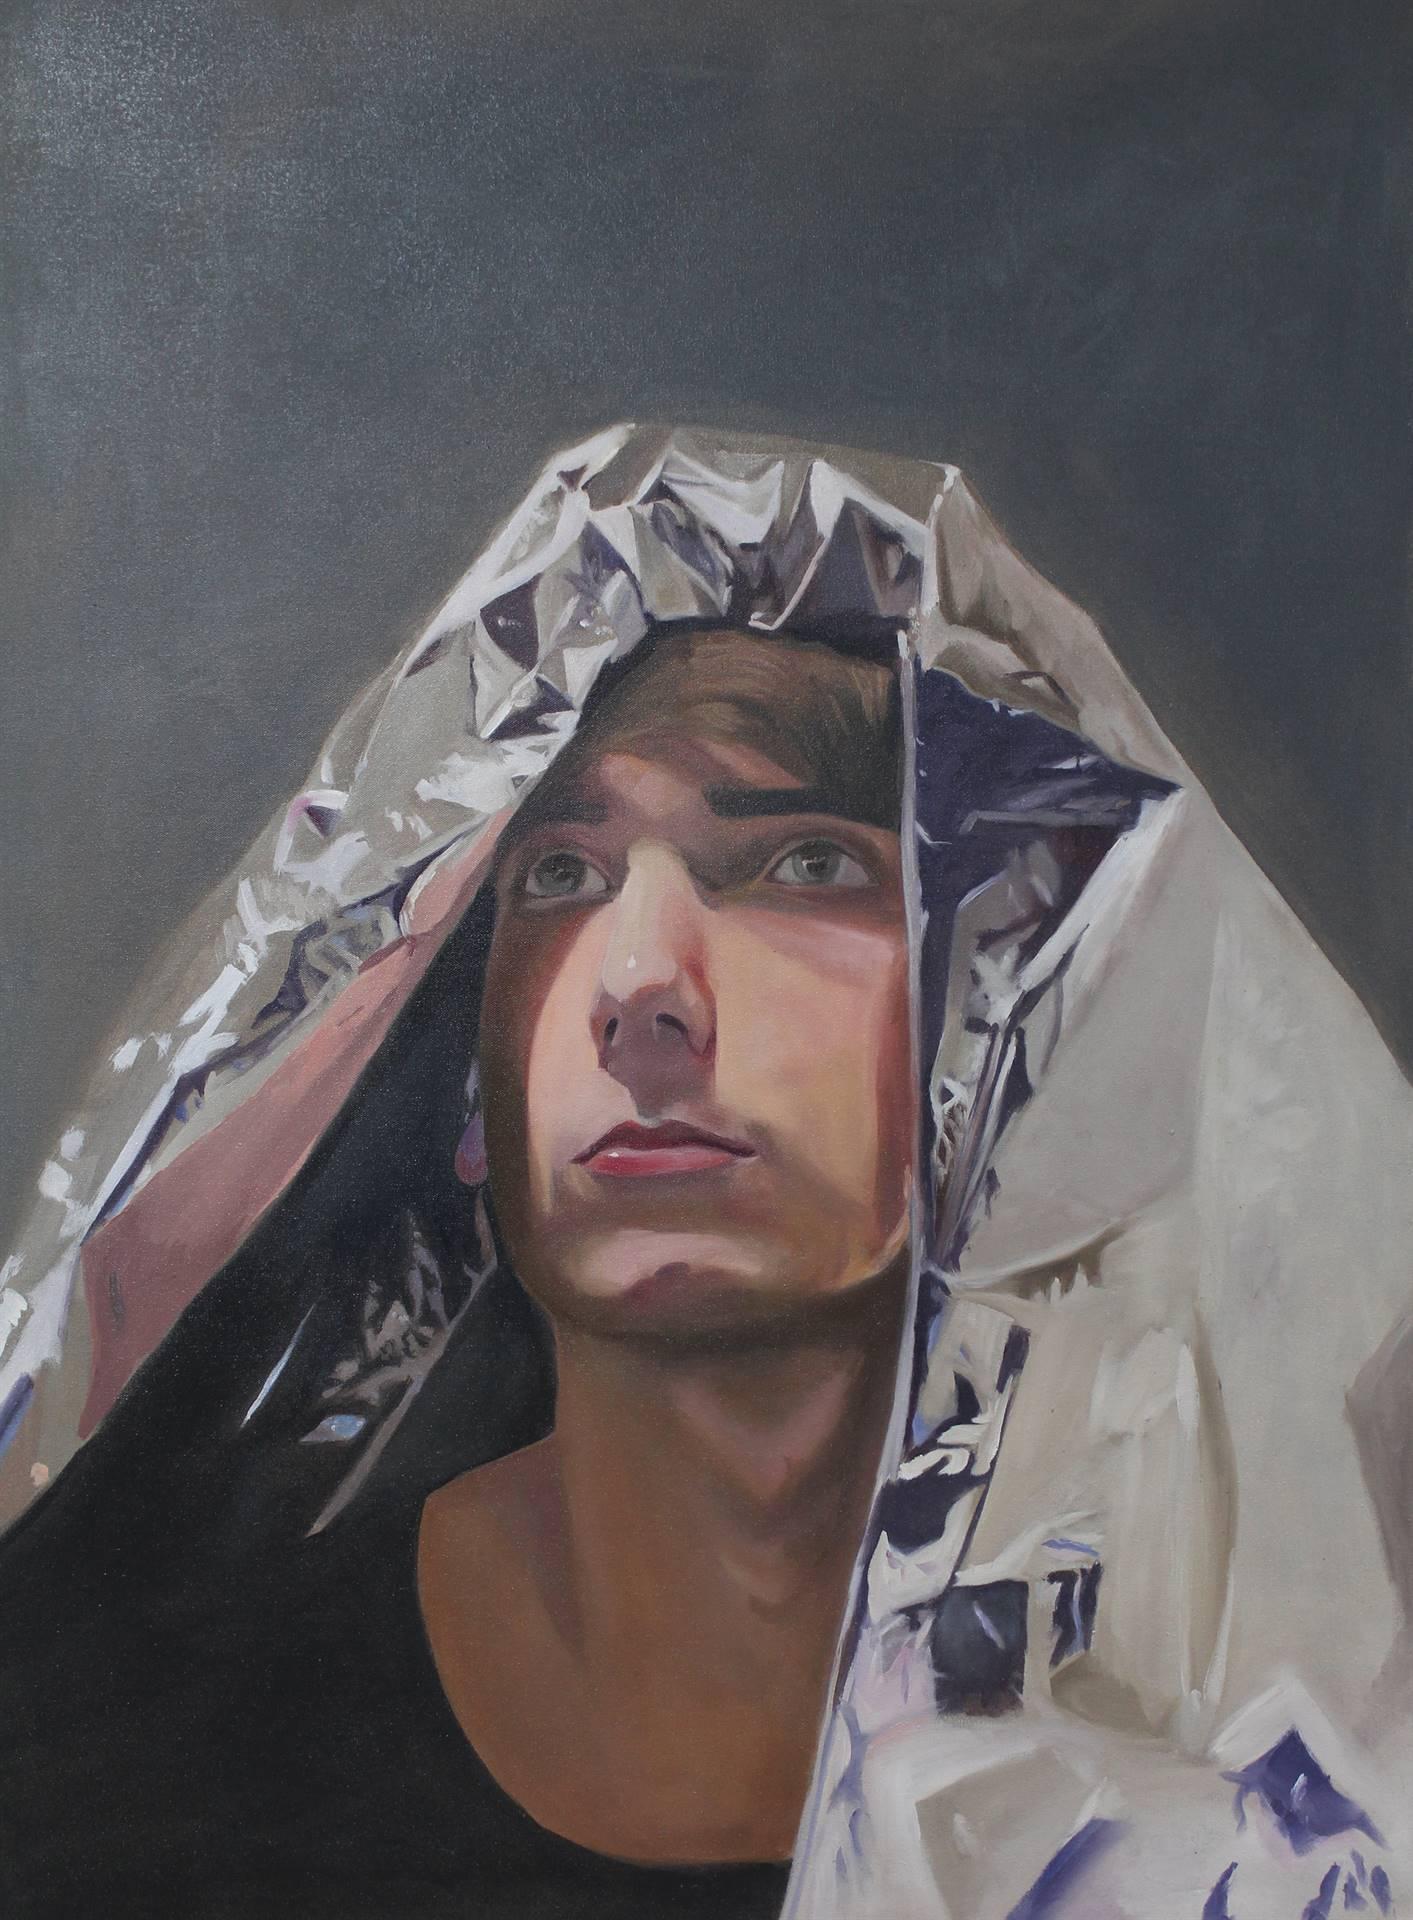 Reflective Protection, Miles Callahan